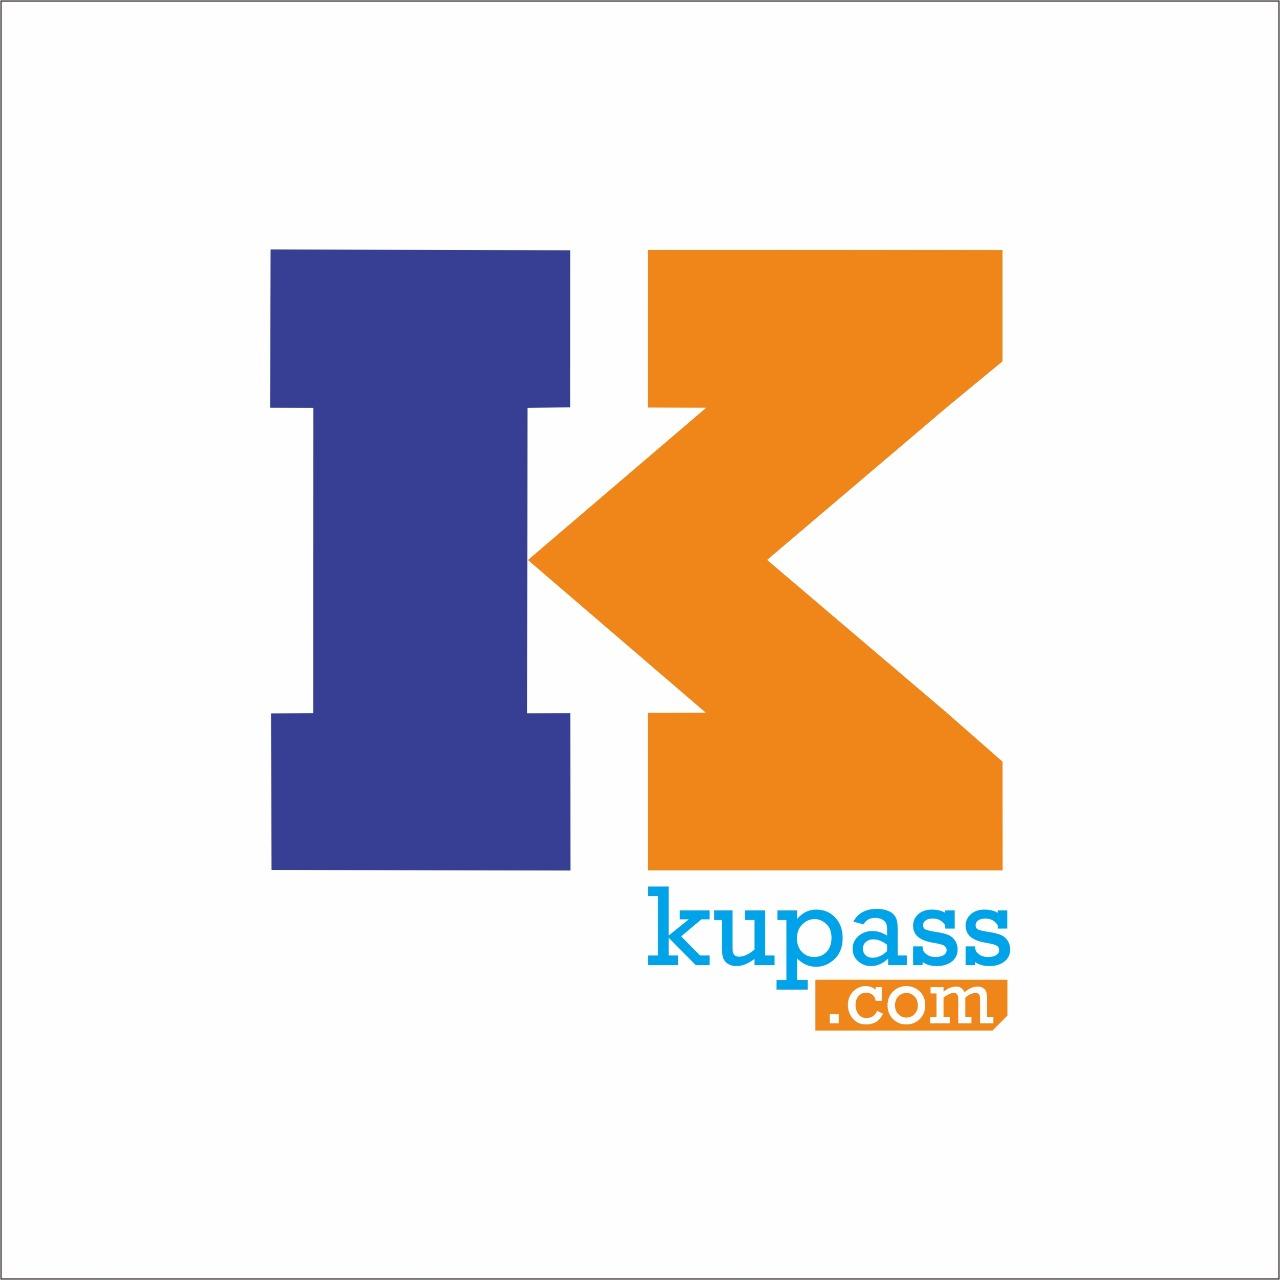 KUPASS